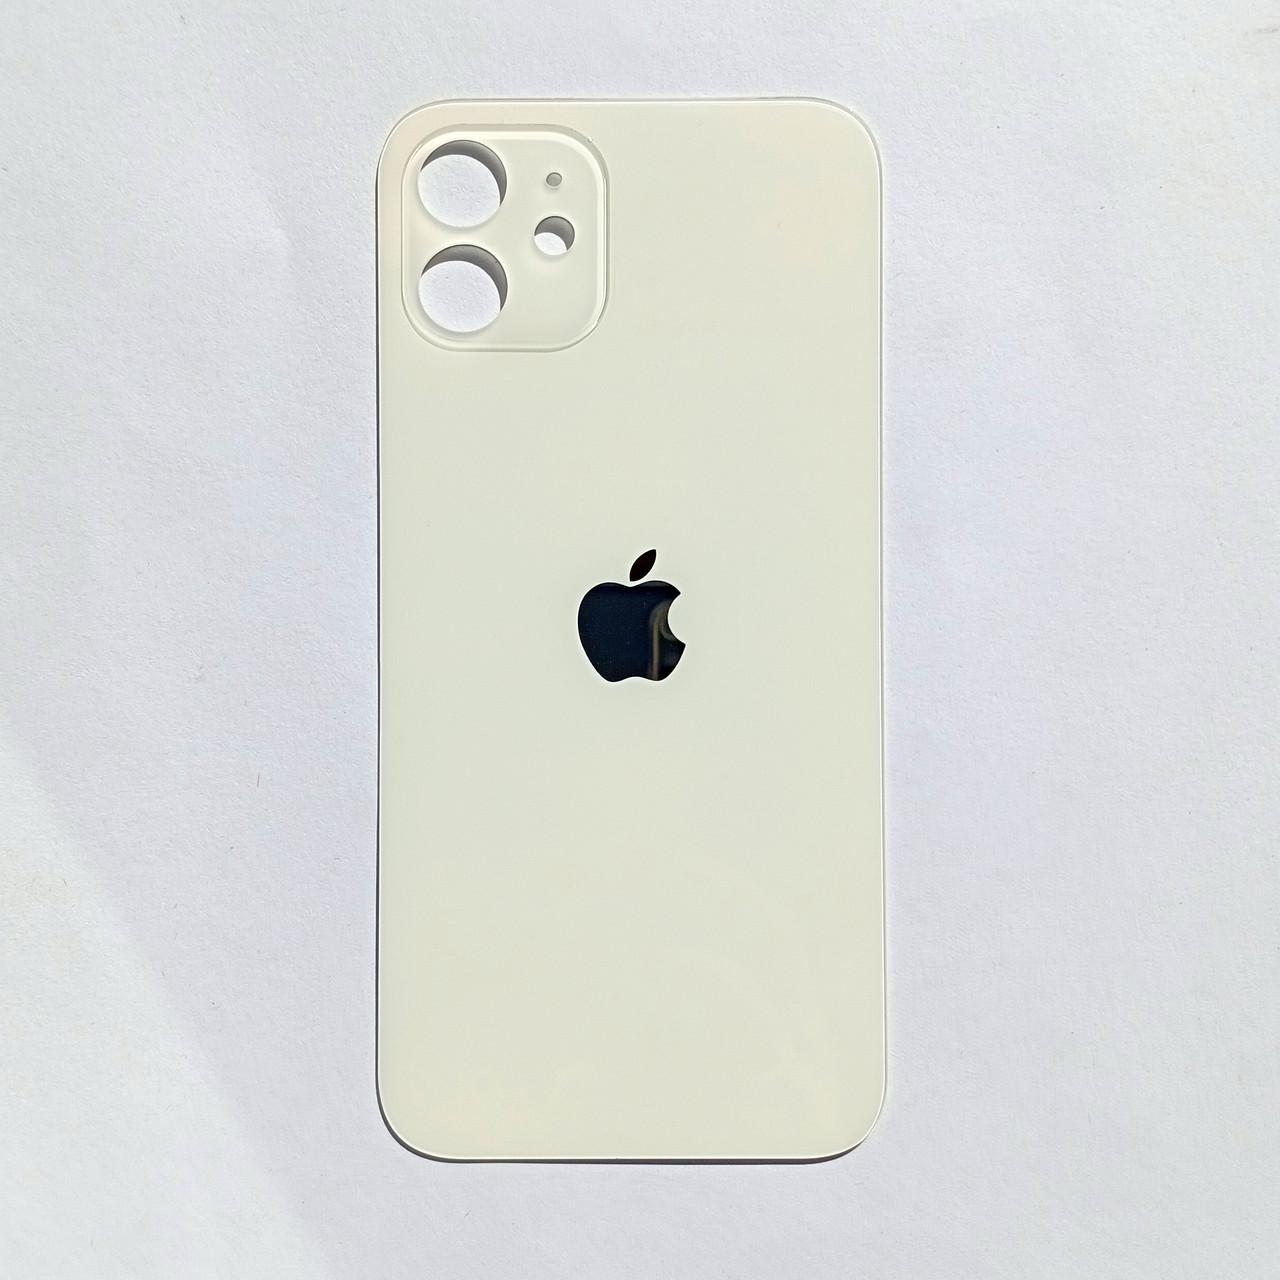 Задня панель корпусу Novacel для Apple iPhone 12 Silver Big Hole